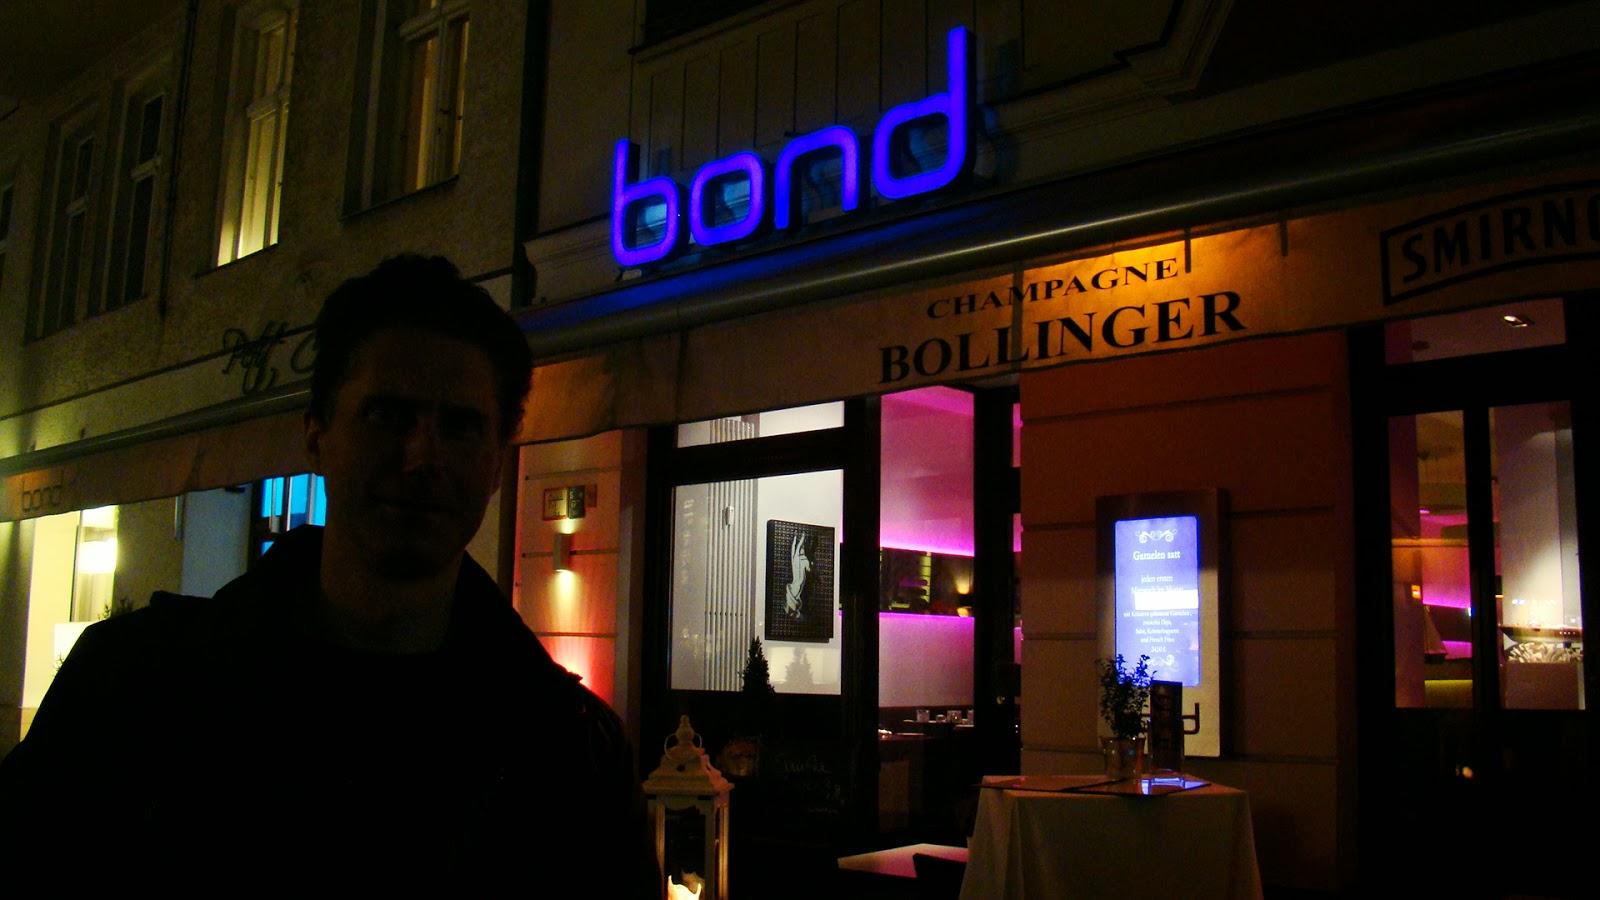 007 travelers 007 theme restaurant bond berlin germany. Black Bedroom Furniture Sets. Home Design Ideas